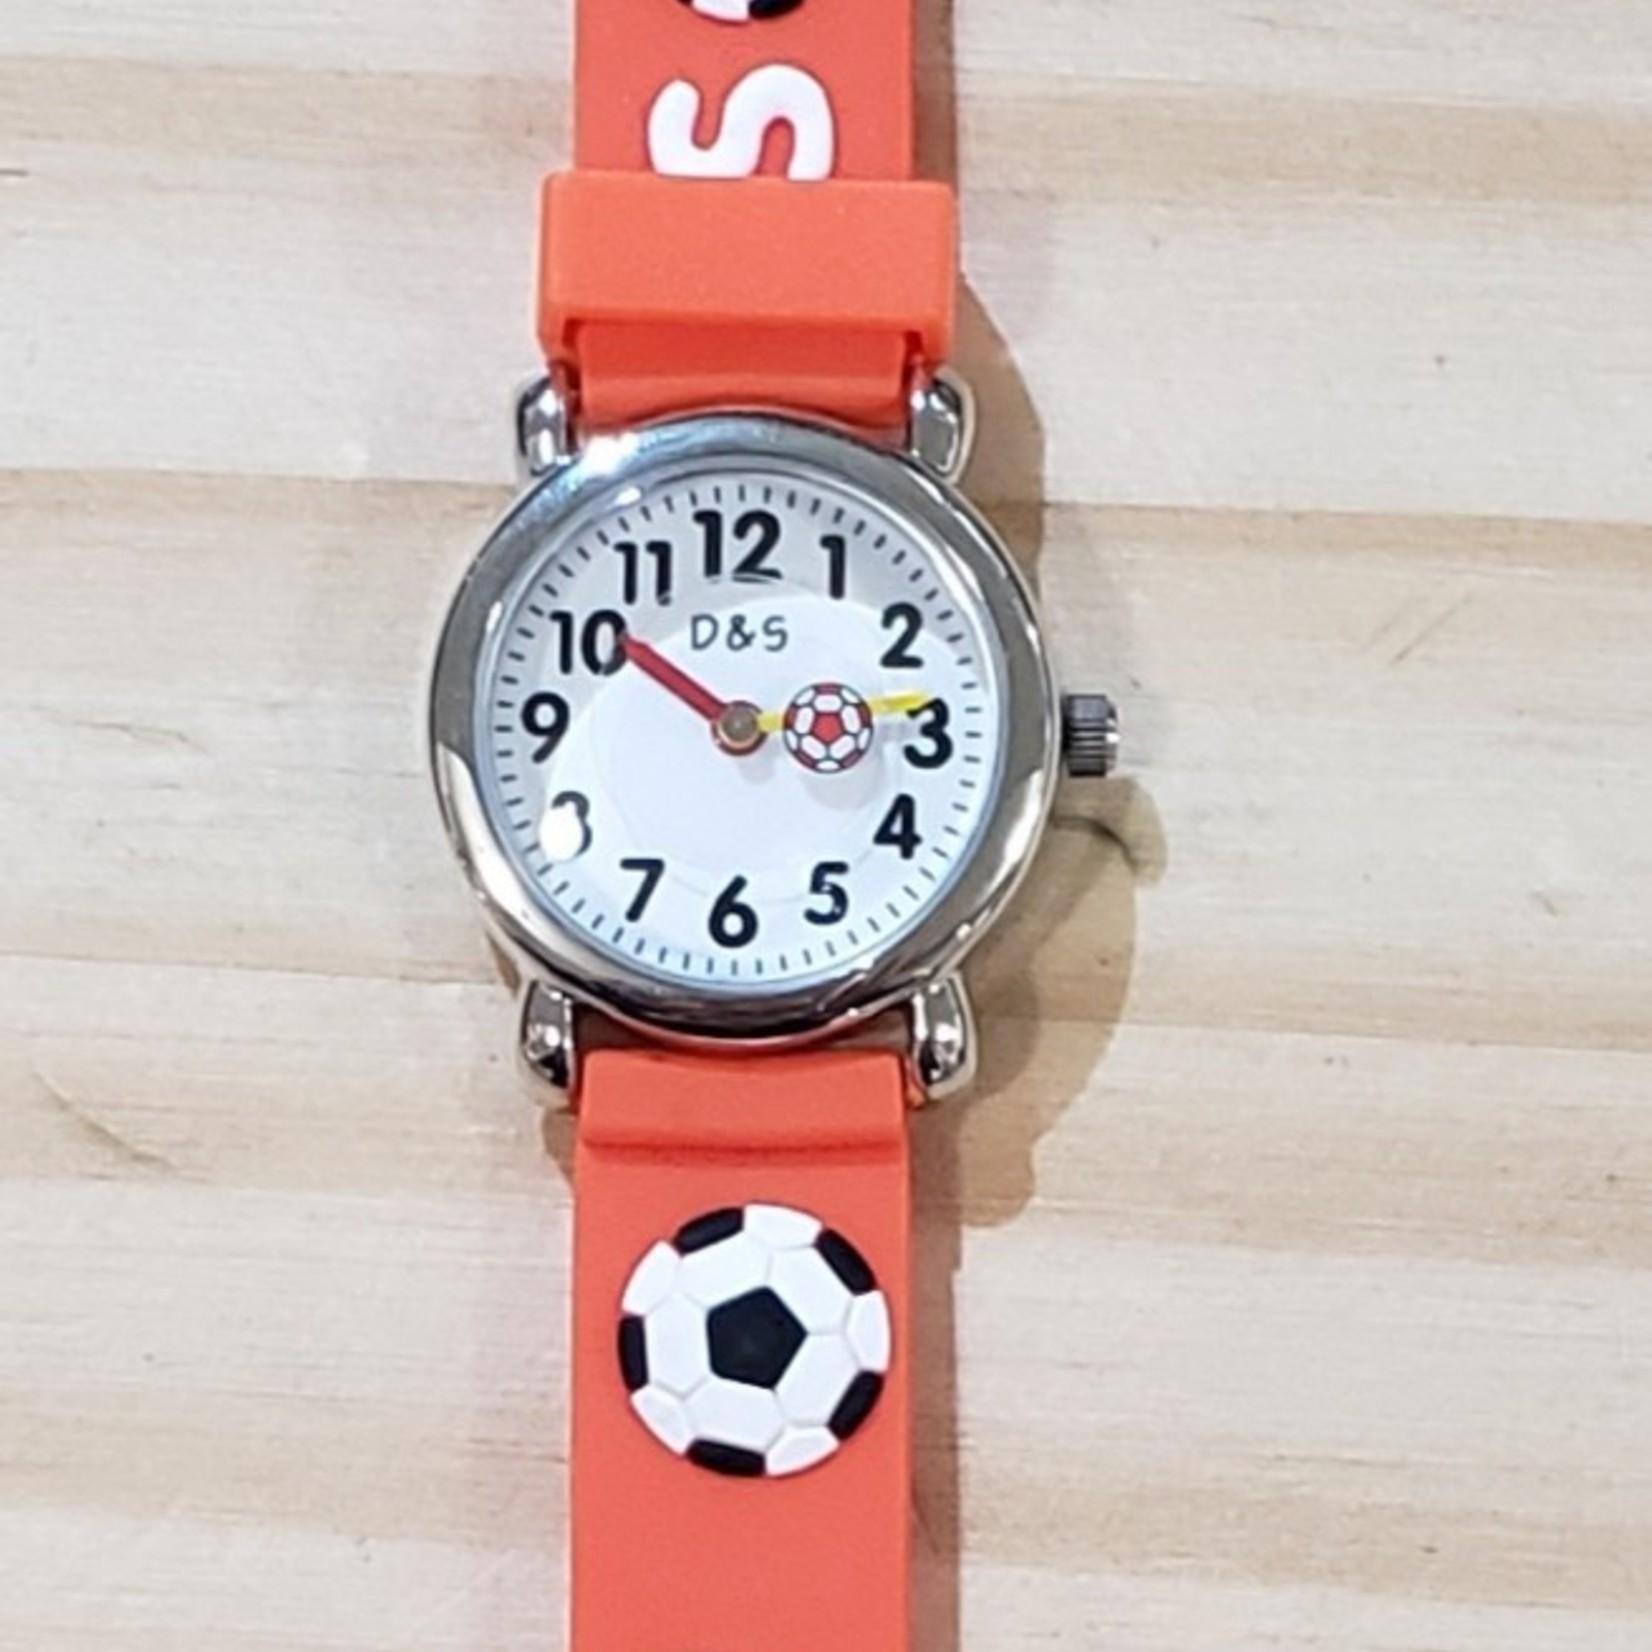 D&S Imports Watch - Soccer, Orange